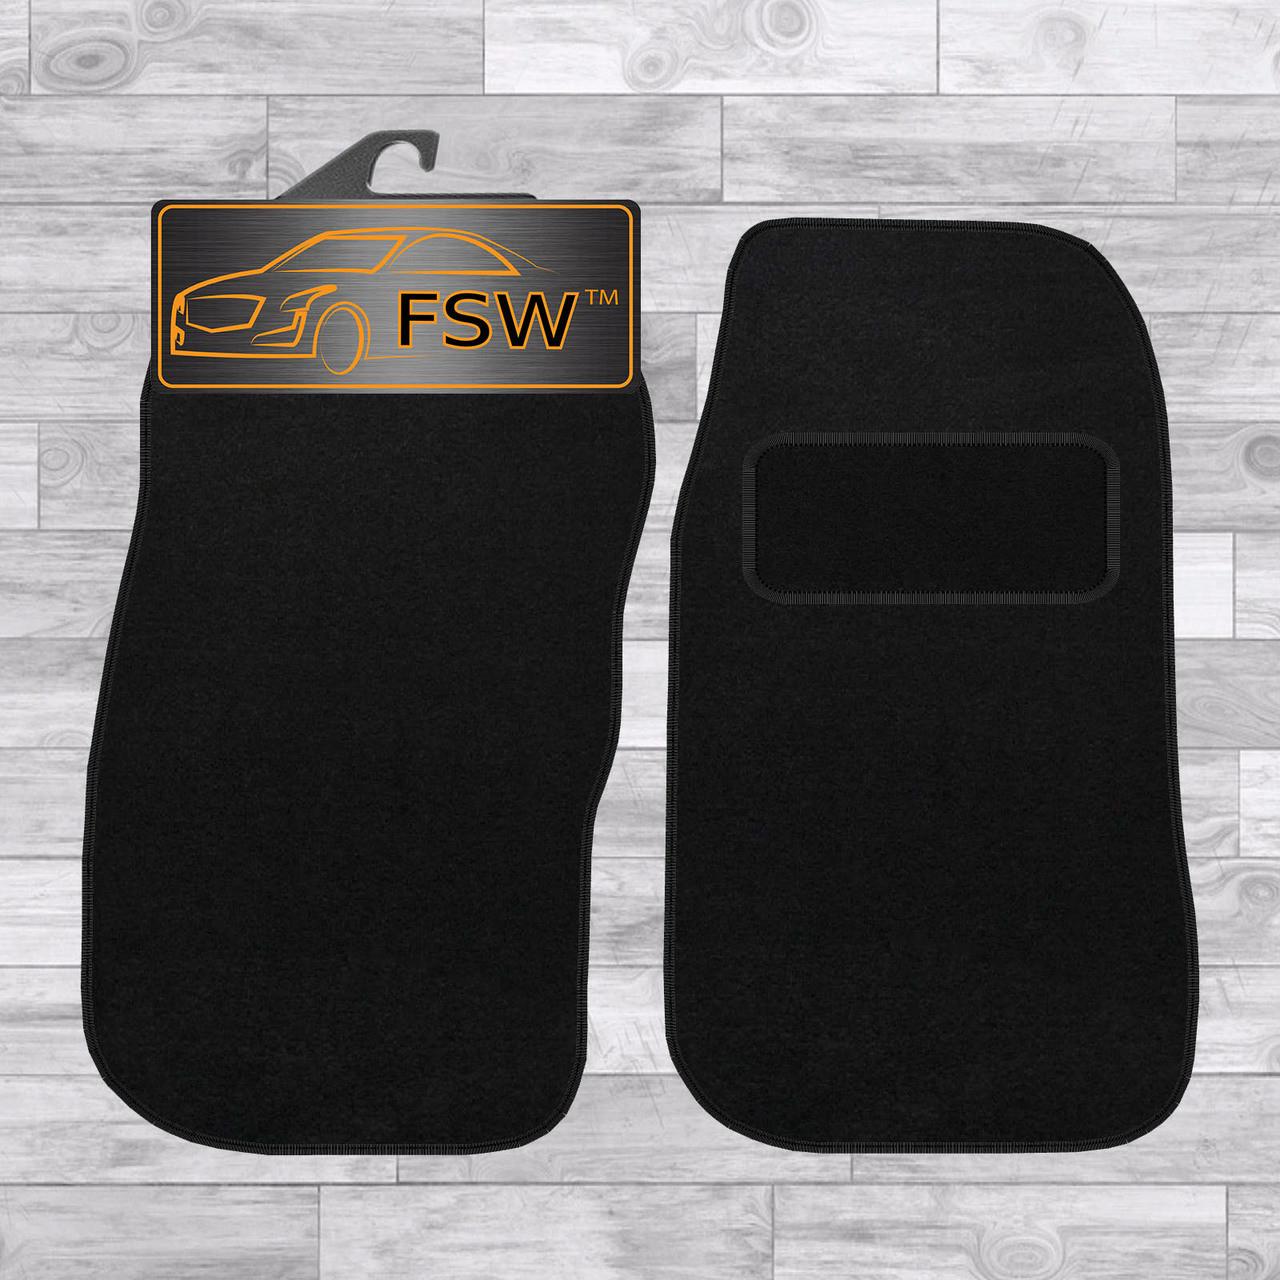 ford transit van 2000 2006 2 piece front tailored classic car floor mats black [ 1280 x 1280 Pixel ]